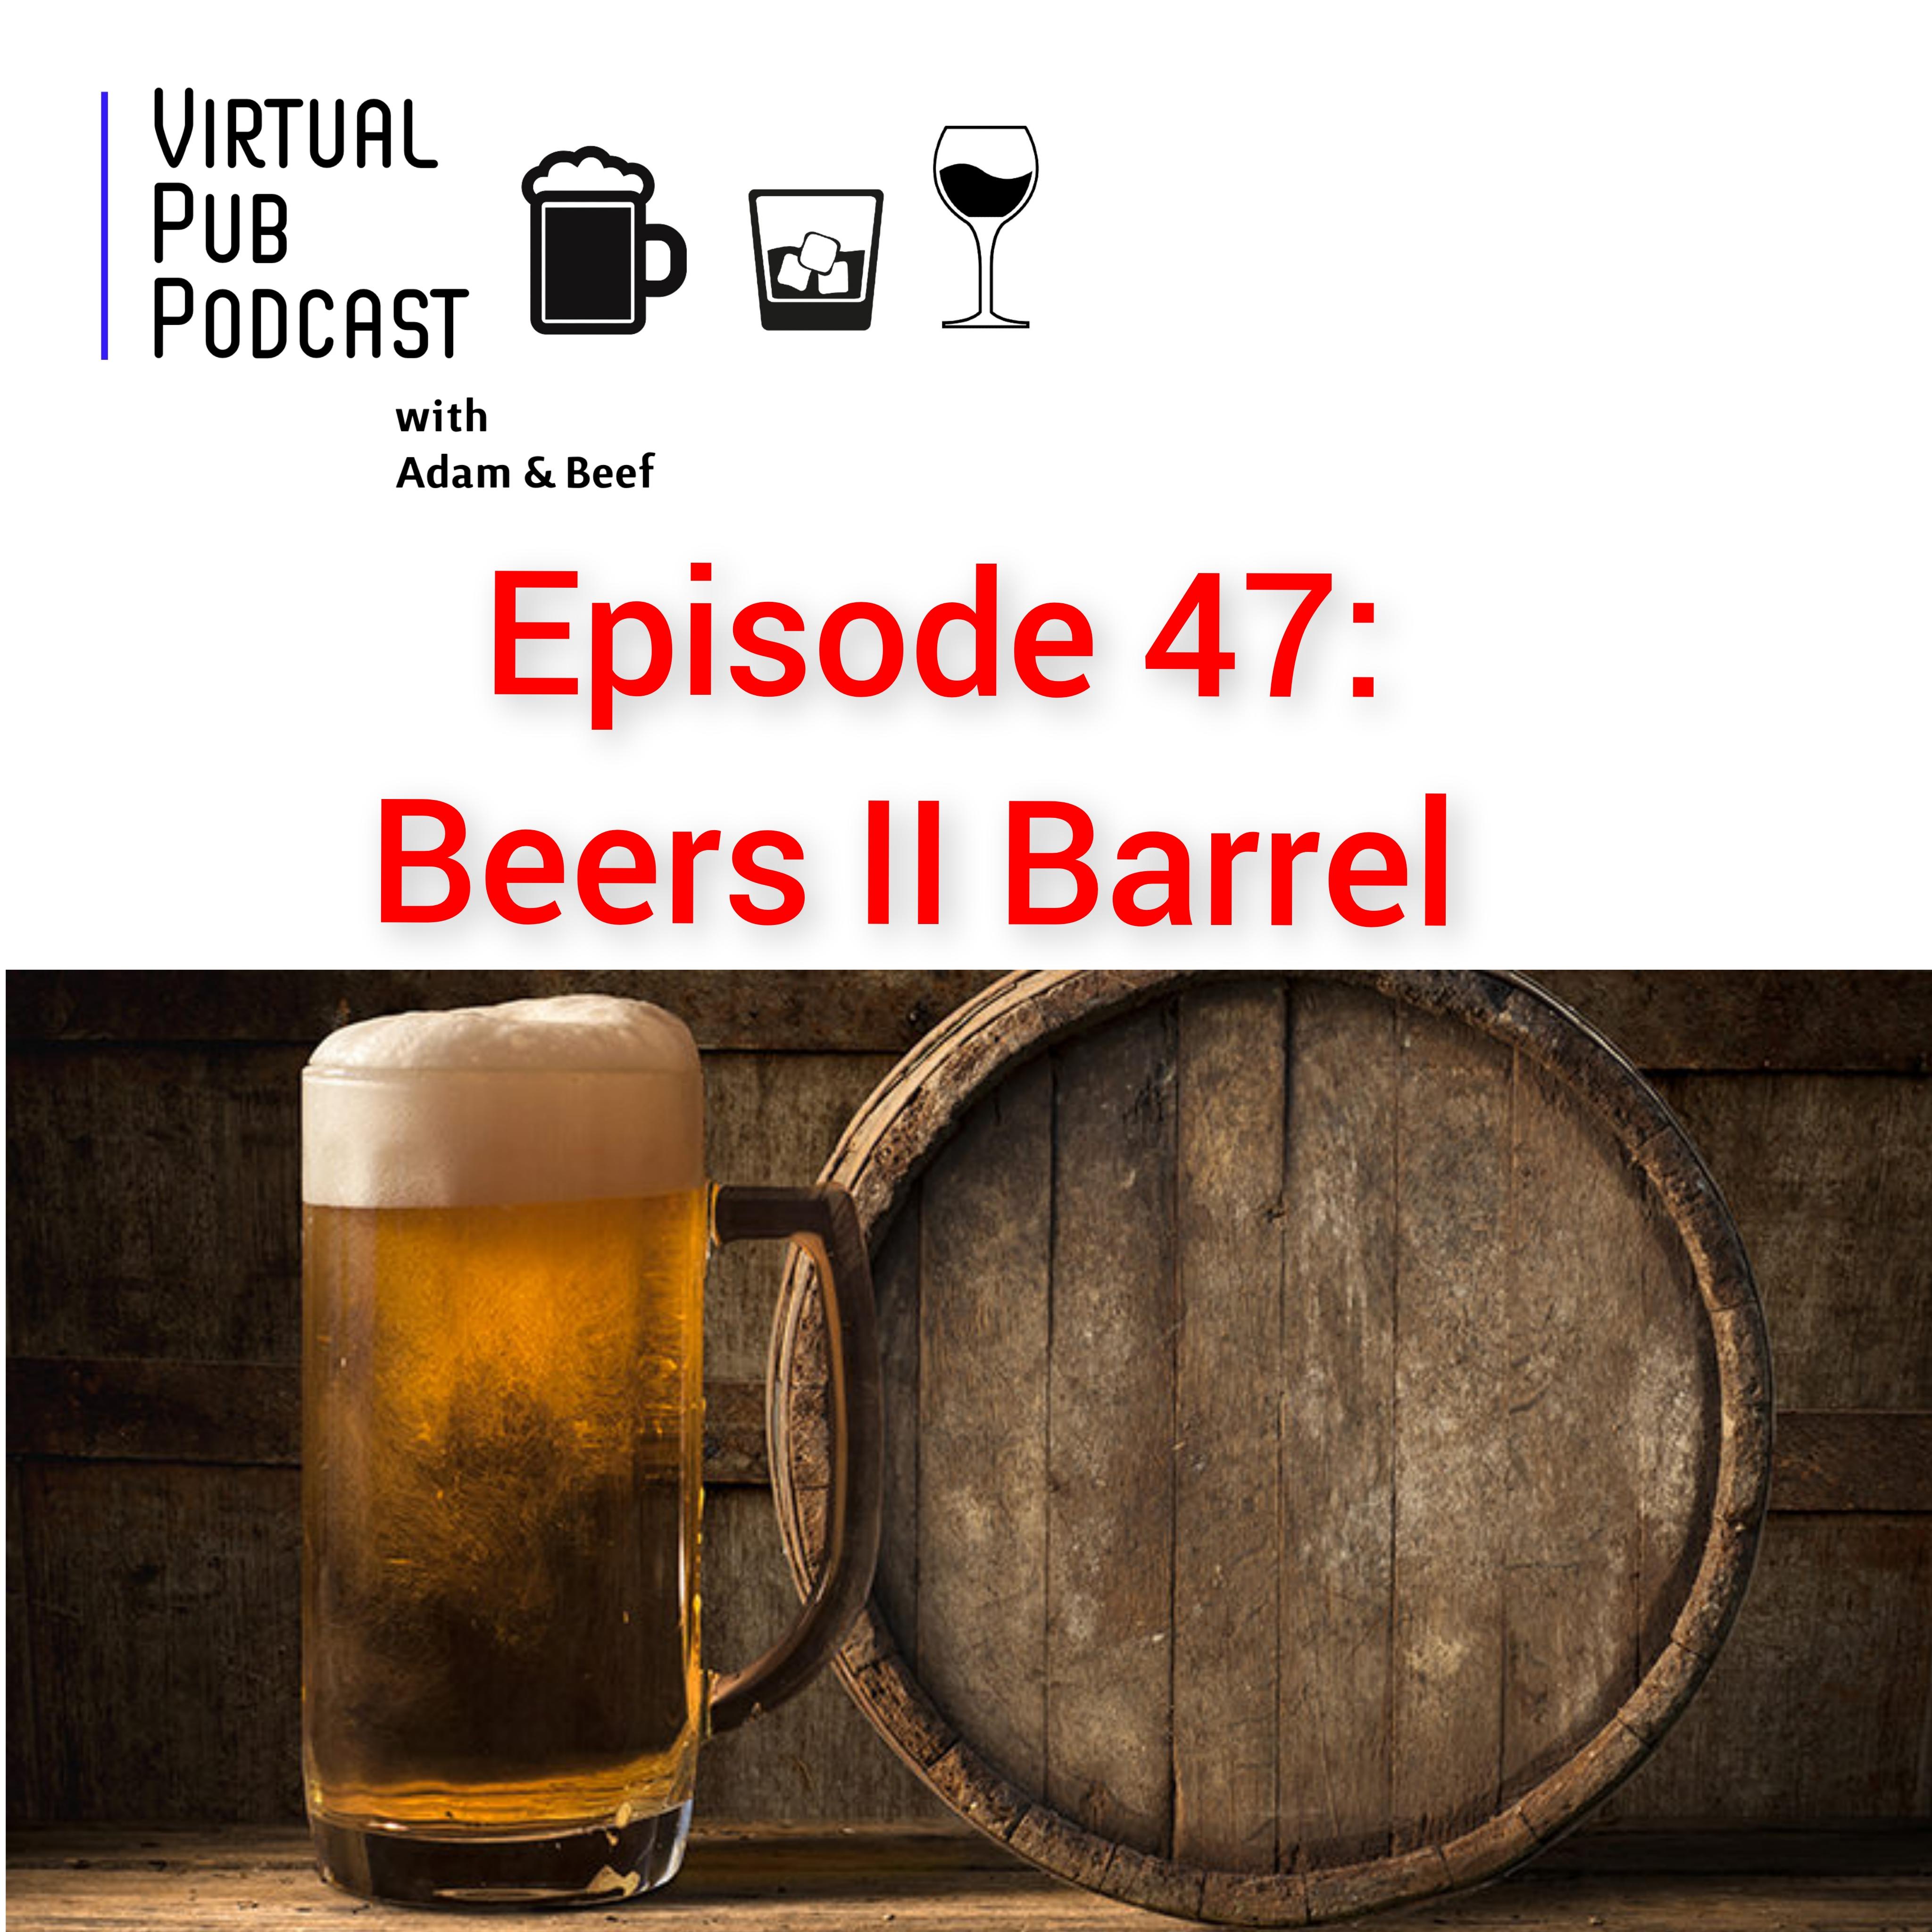 Virtual Pub Podcast